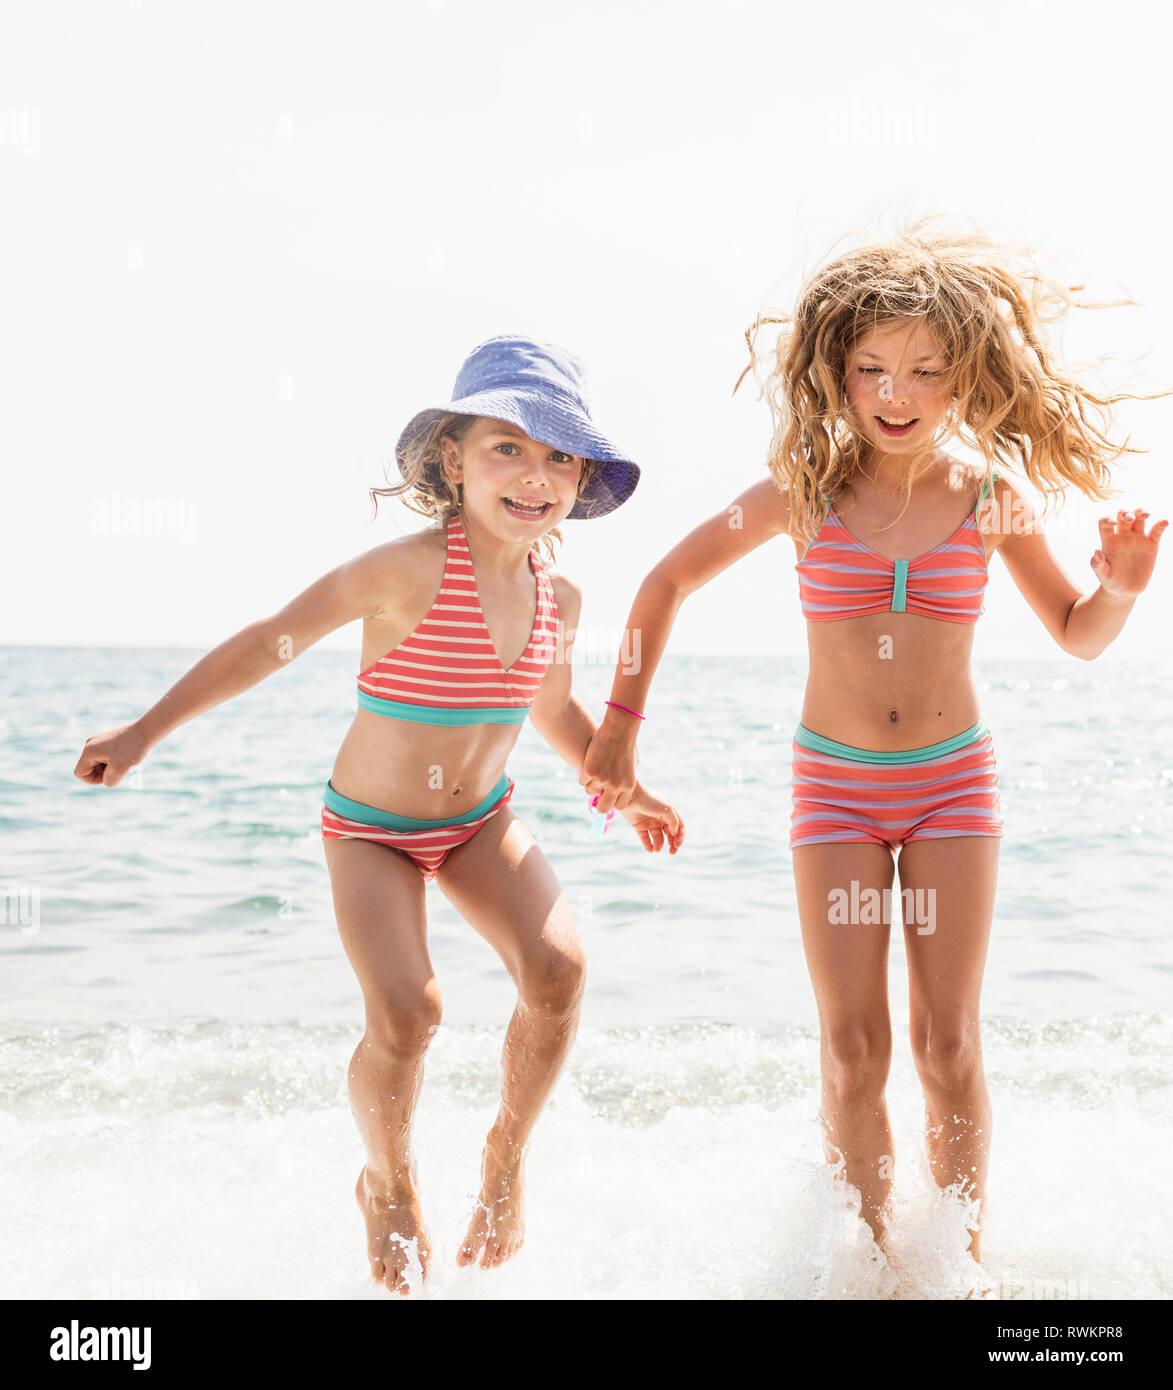 Two sisters in matching bikinis splashing in sea, Portoferraio, Tuscany, Italy - Stock Image